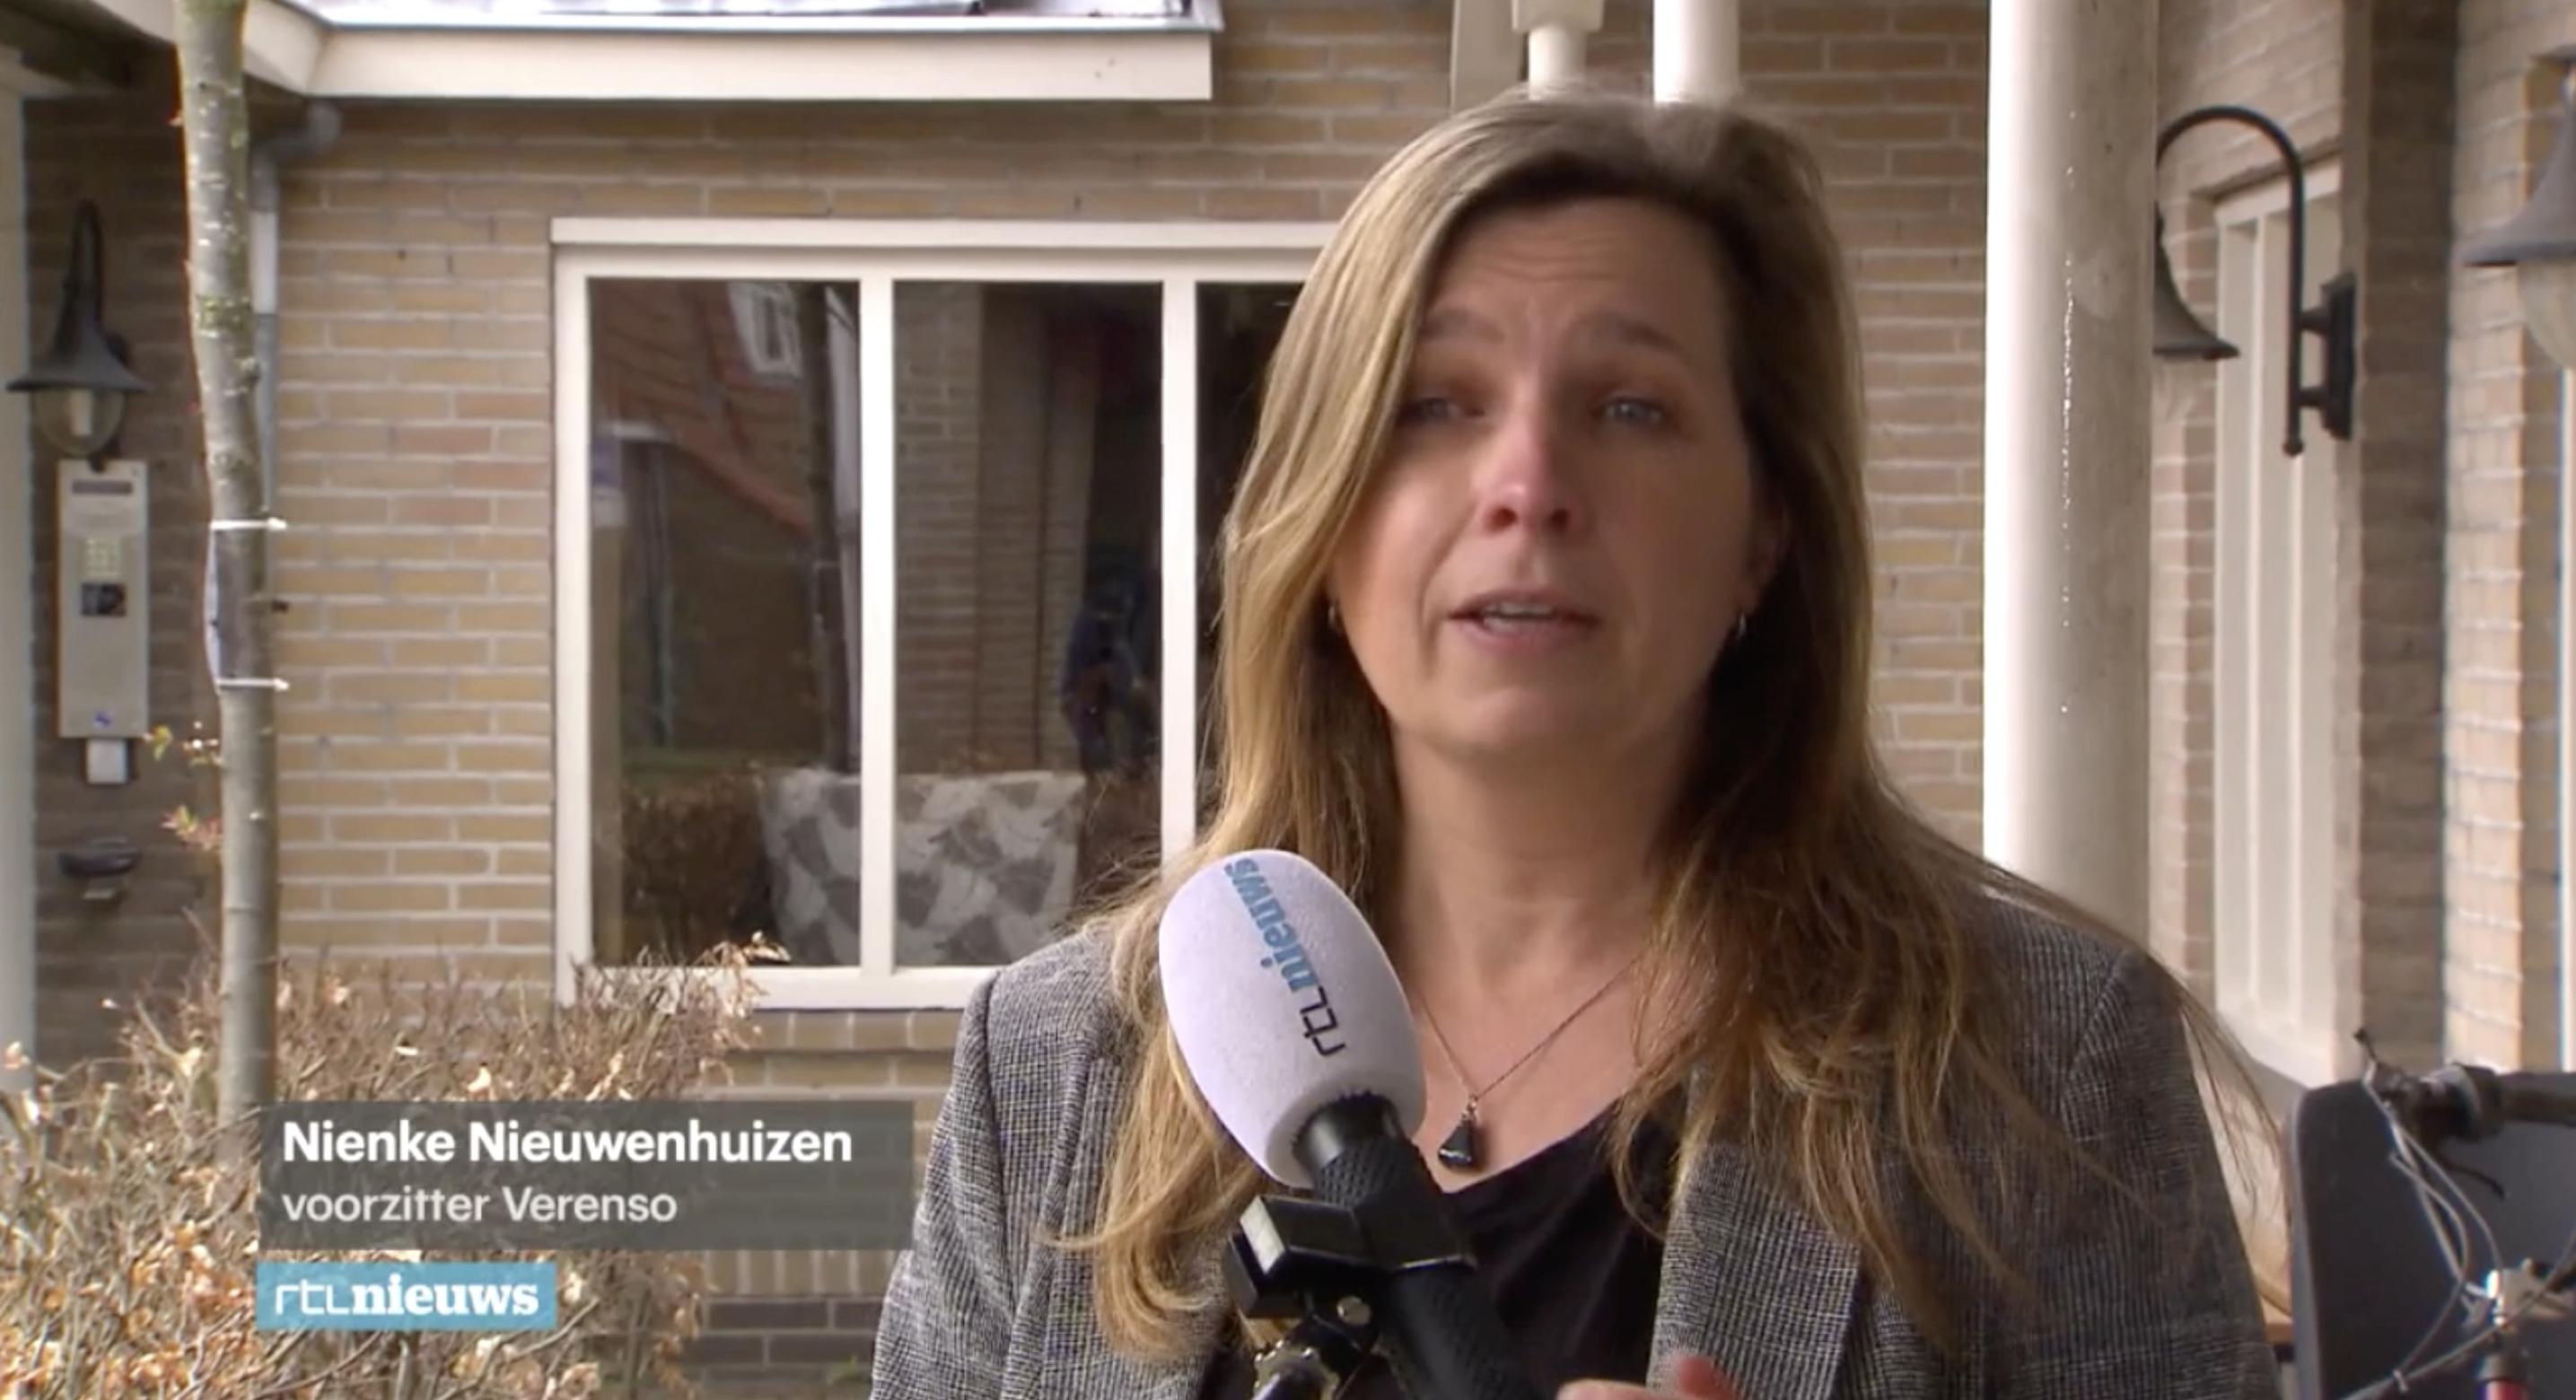 verpleeghuizen Nienke Niewenhuizen corona ysis Gerimedica verenso